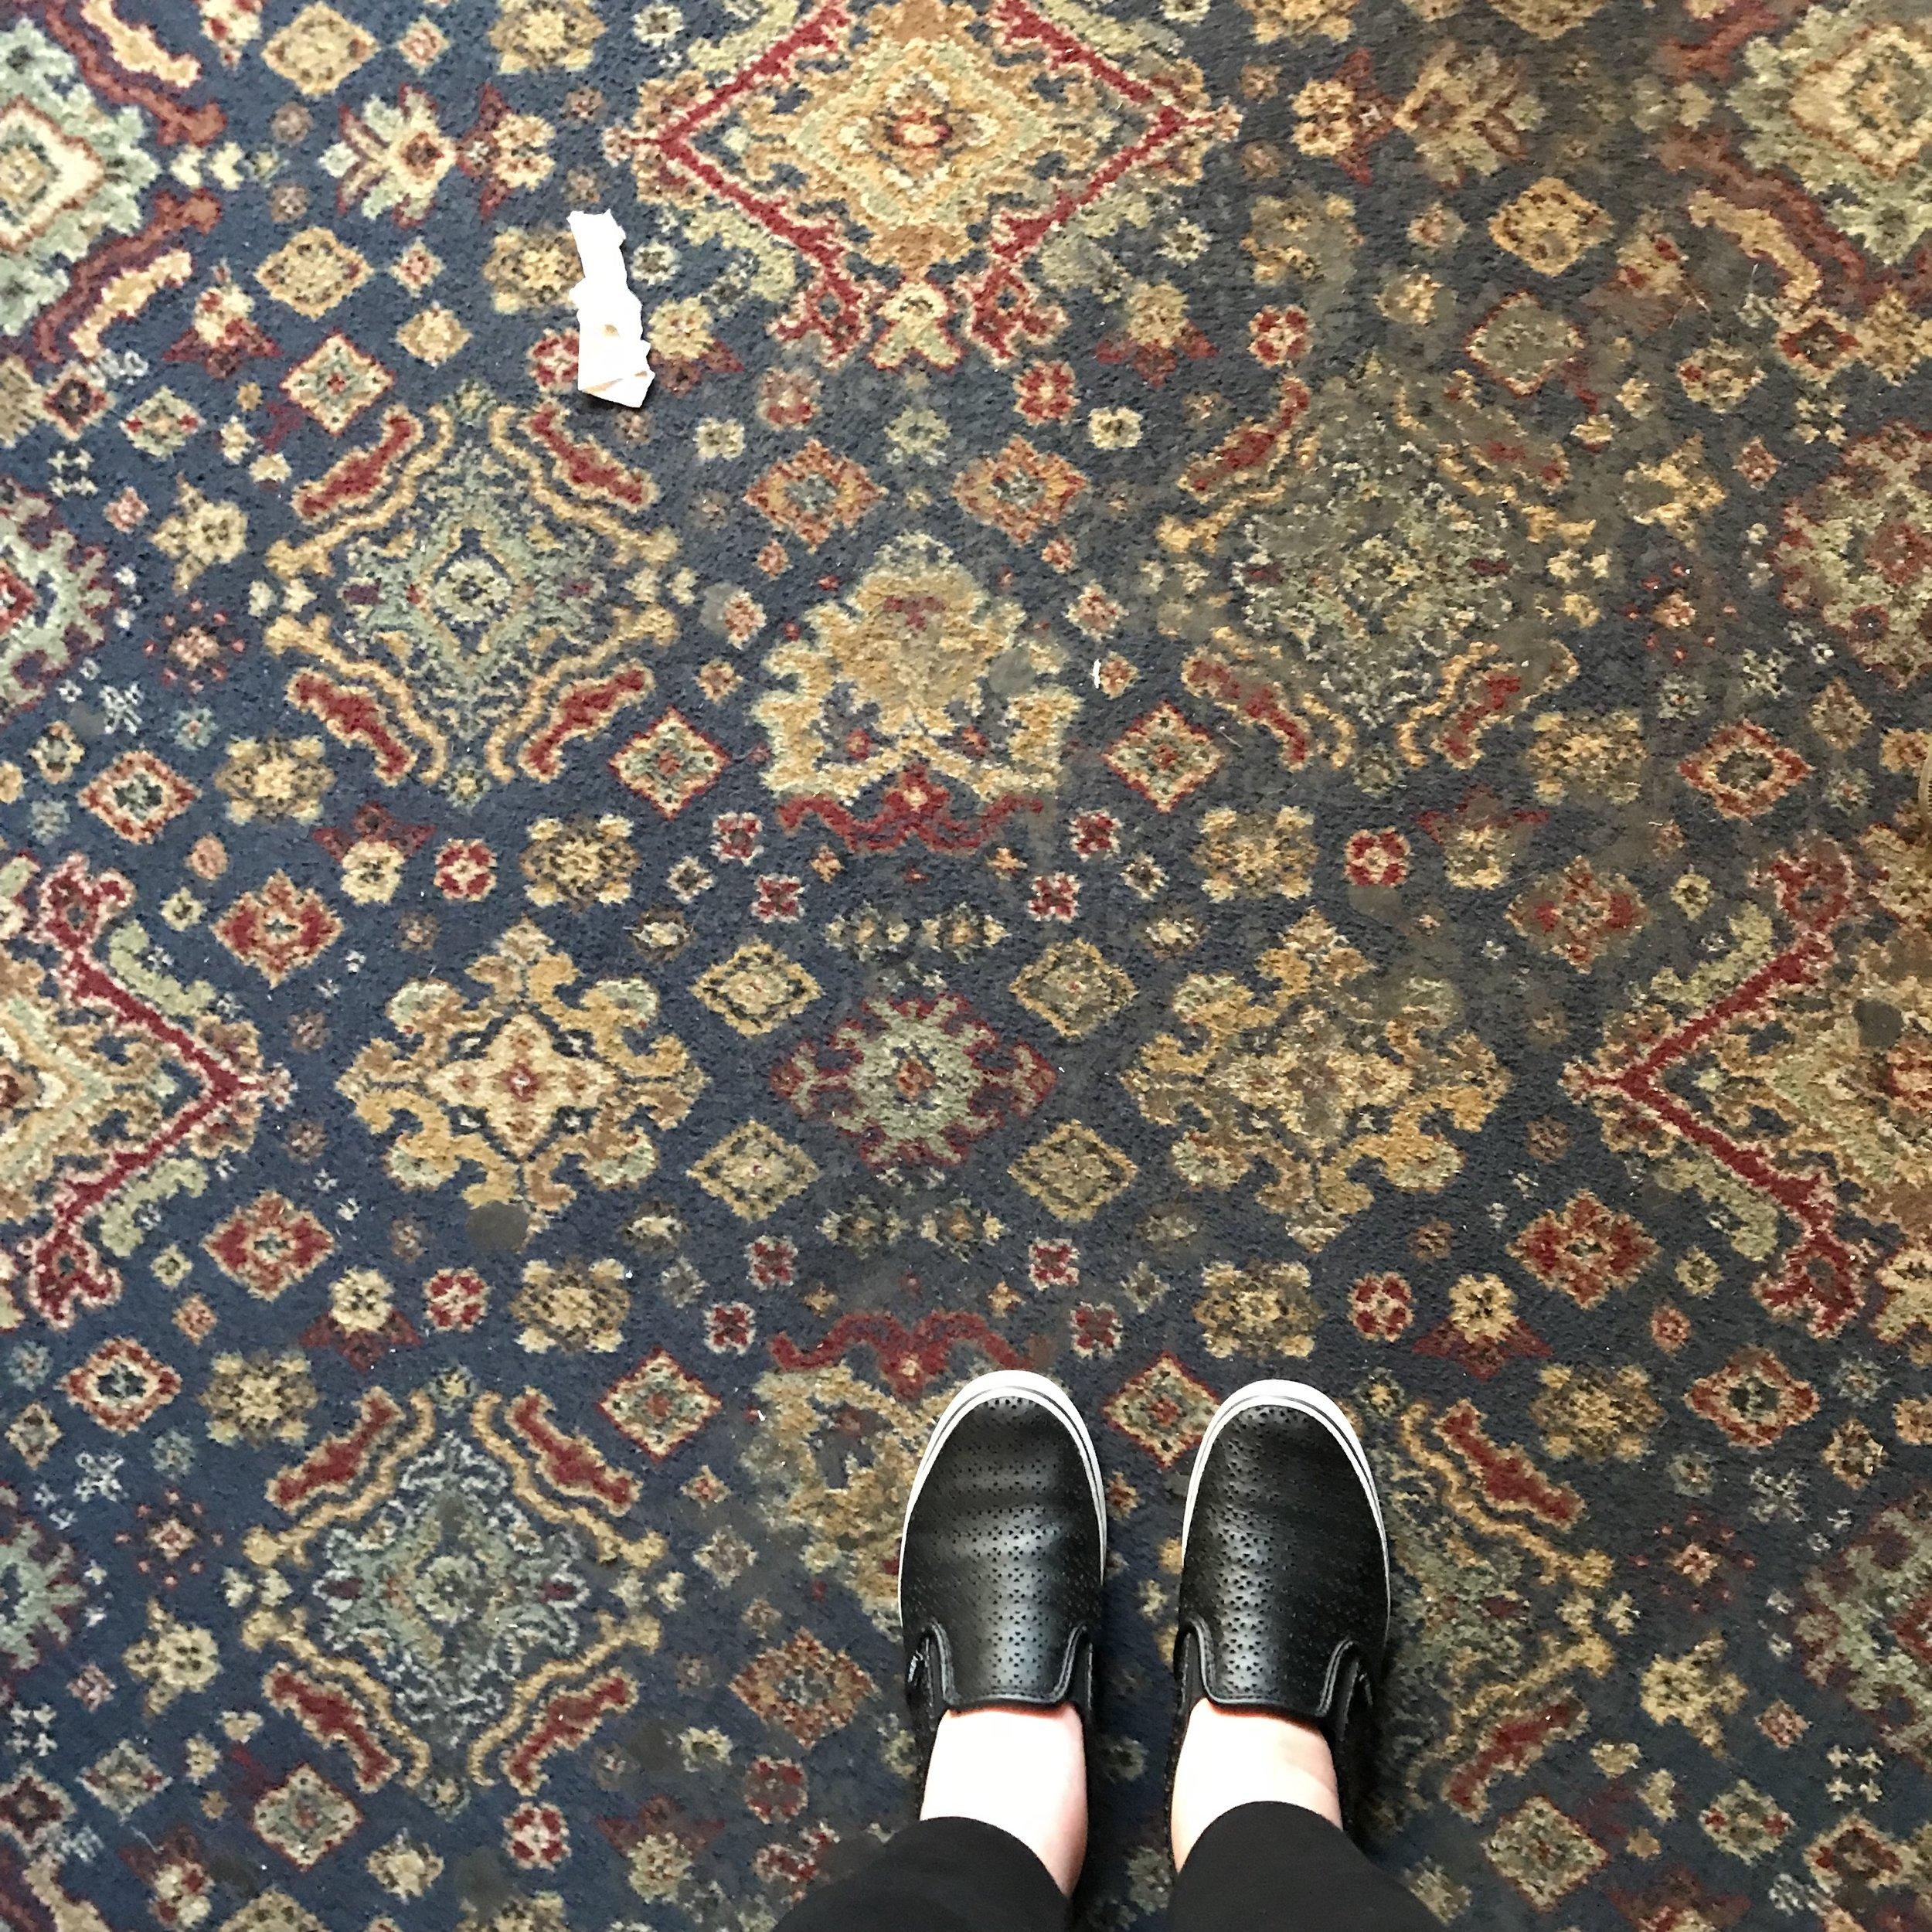 Carpet at Grogan's in Dublin